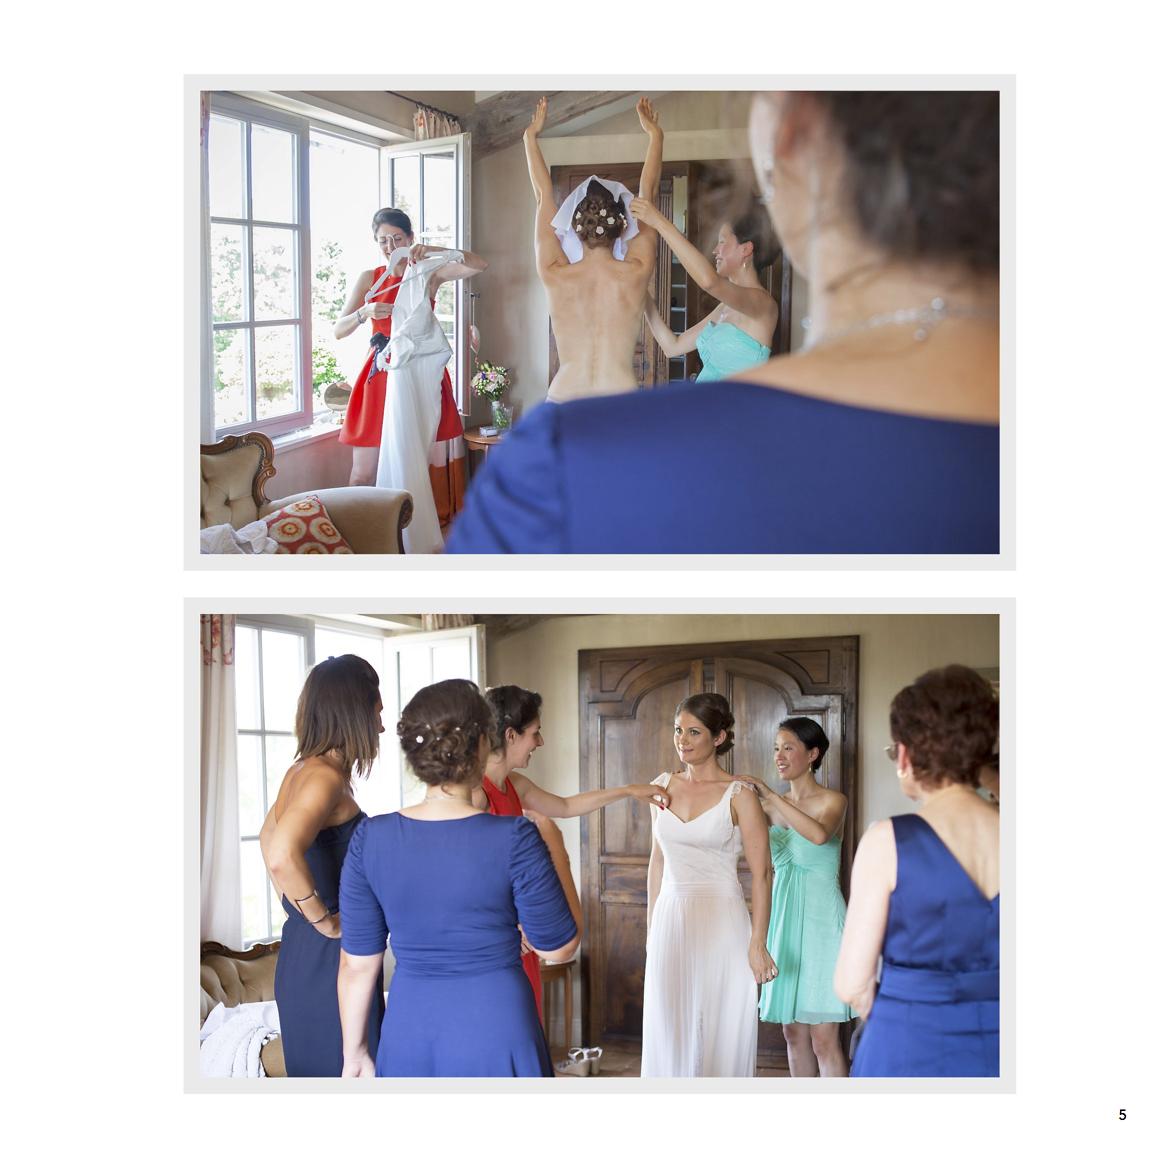 SALON DU MARIAGE 2016 7.jpg